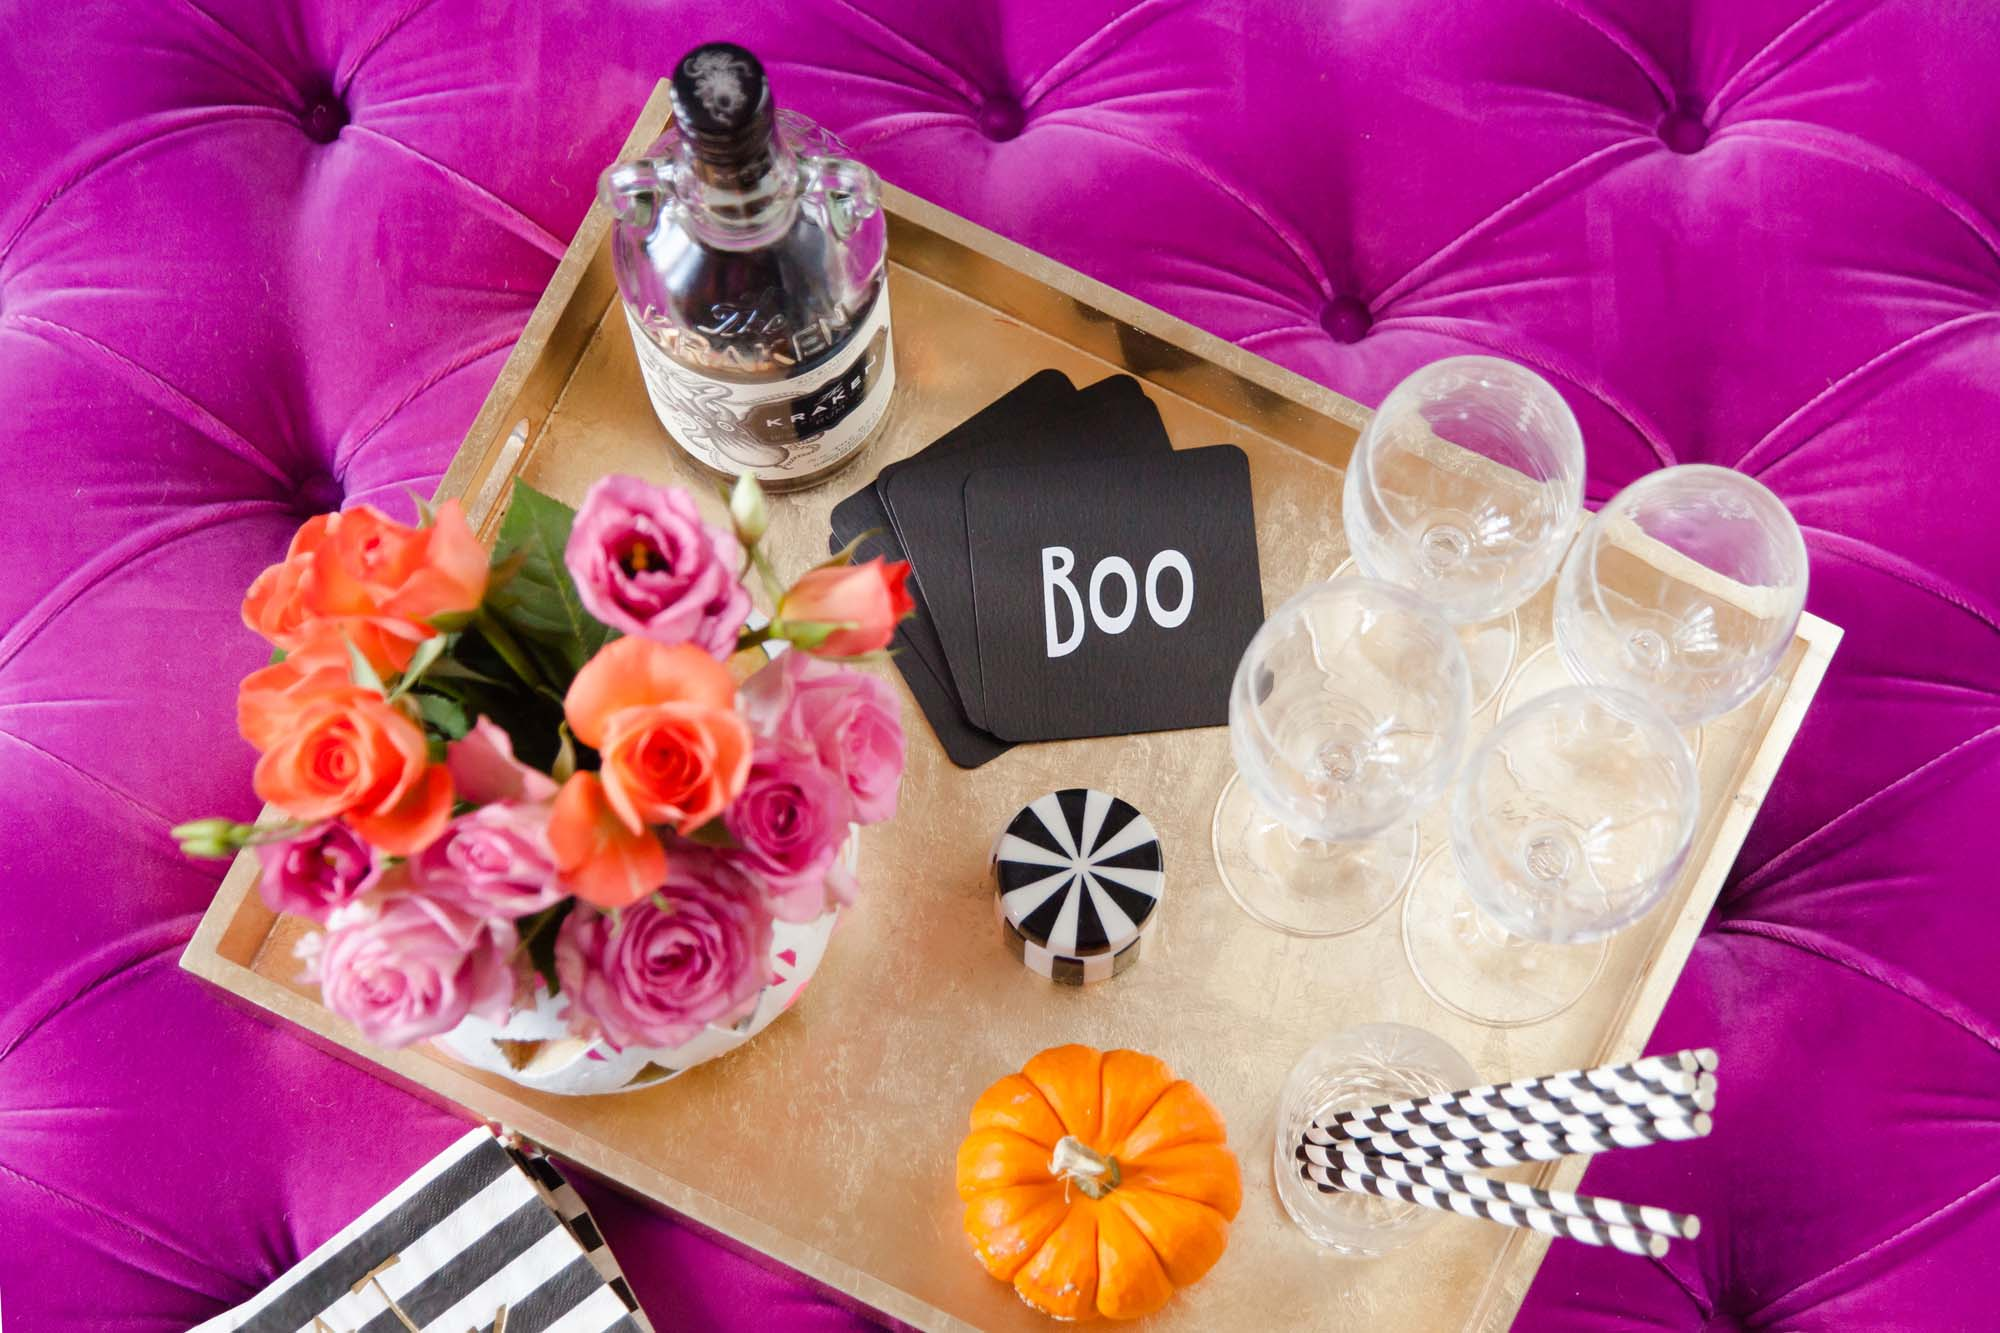 Halloween drinks tray styling